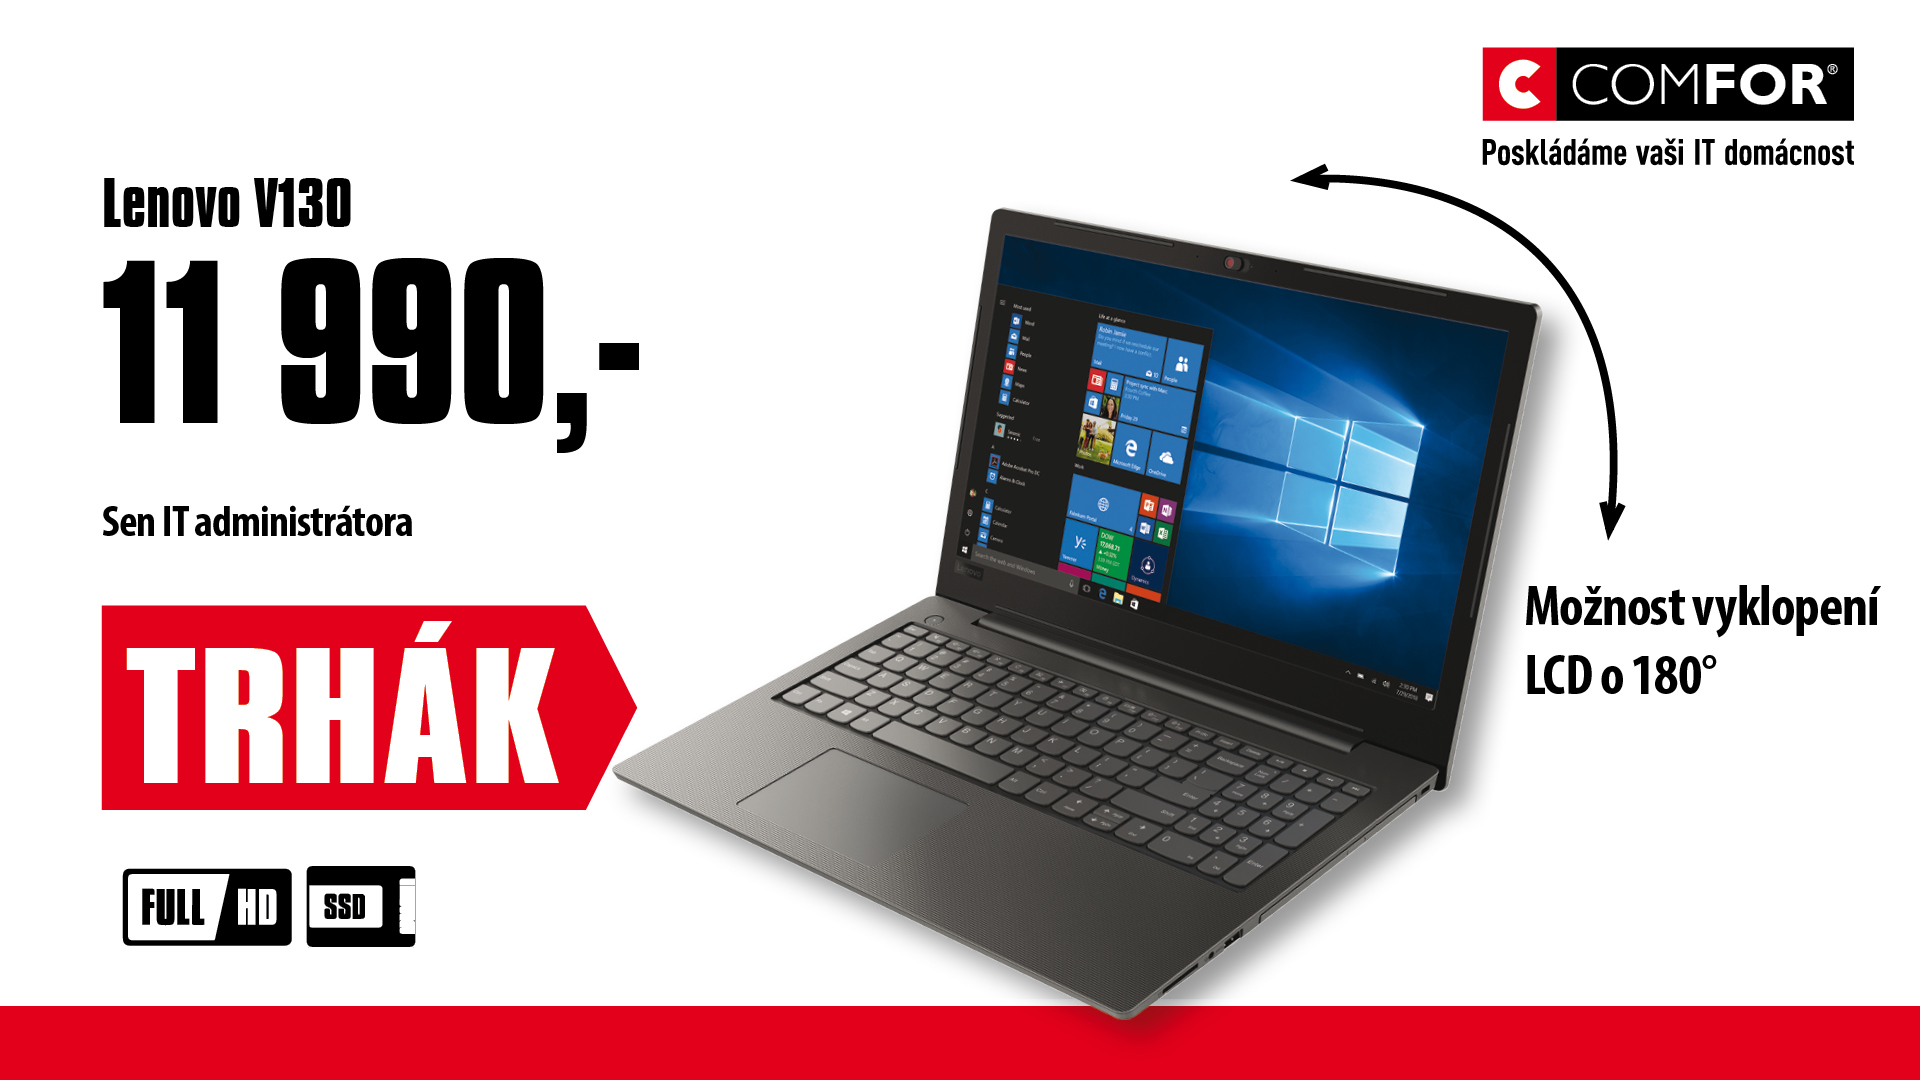 Notebook LENOVO V130